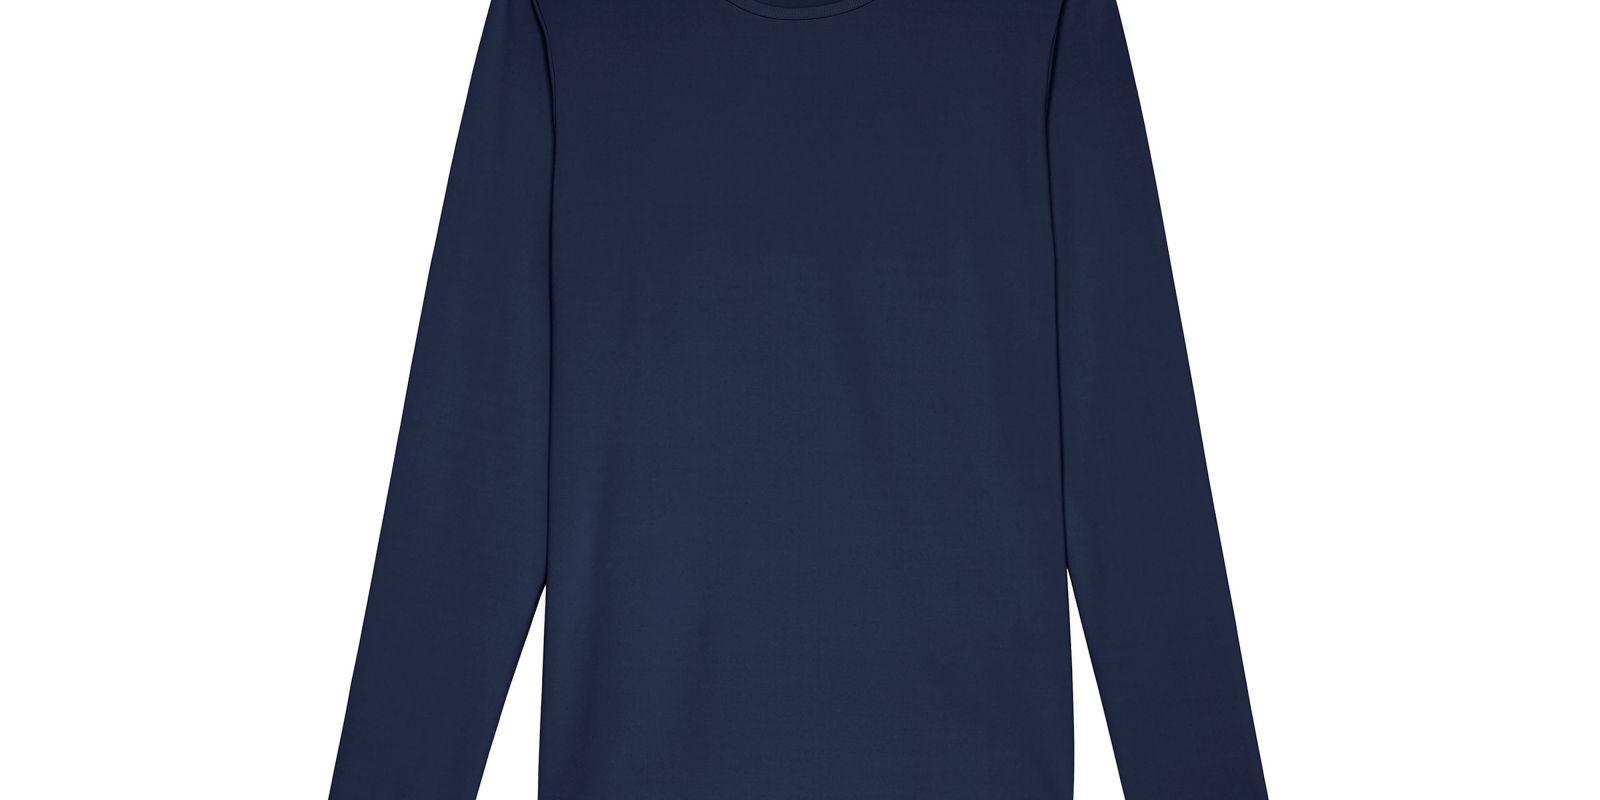 Lands end women s swim tee rashguard review for Lands end logo shirts